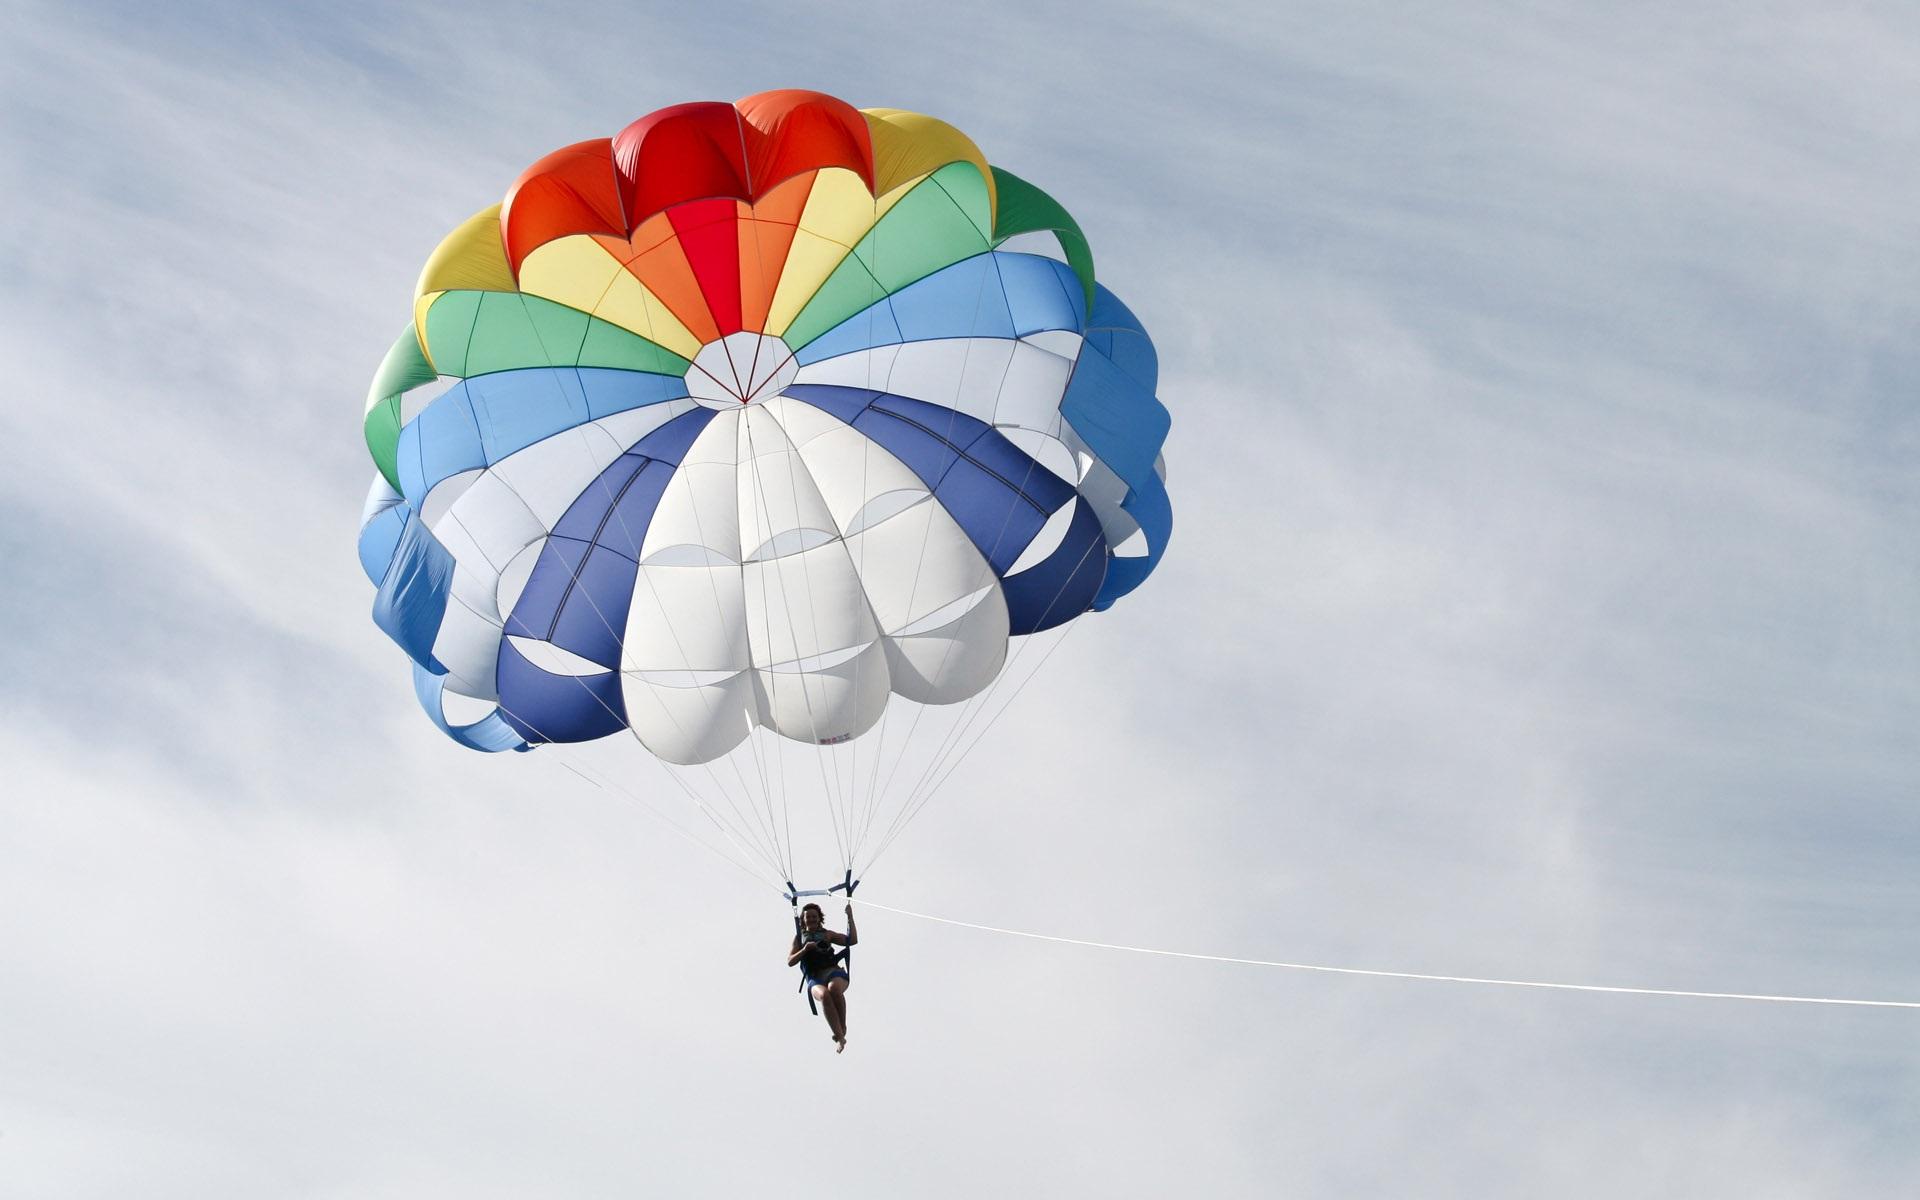 Skydive Free Fall Sports Wallpaper: Skydiving HD Wallpaper